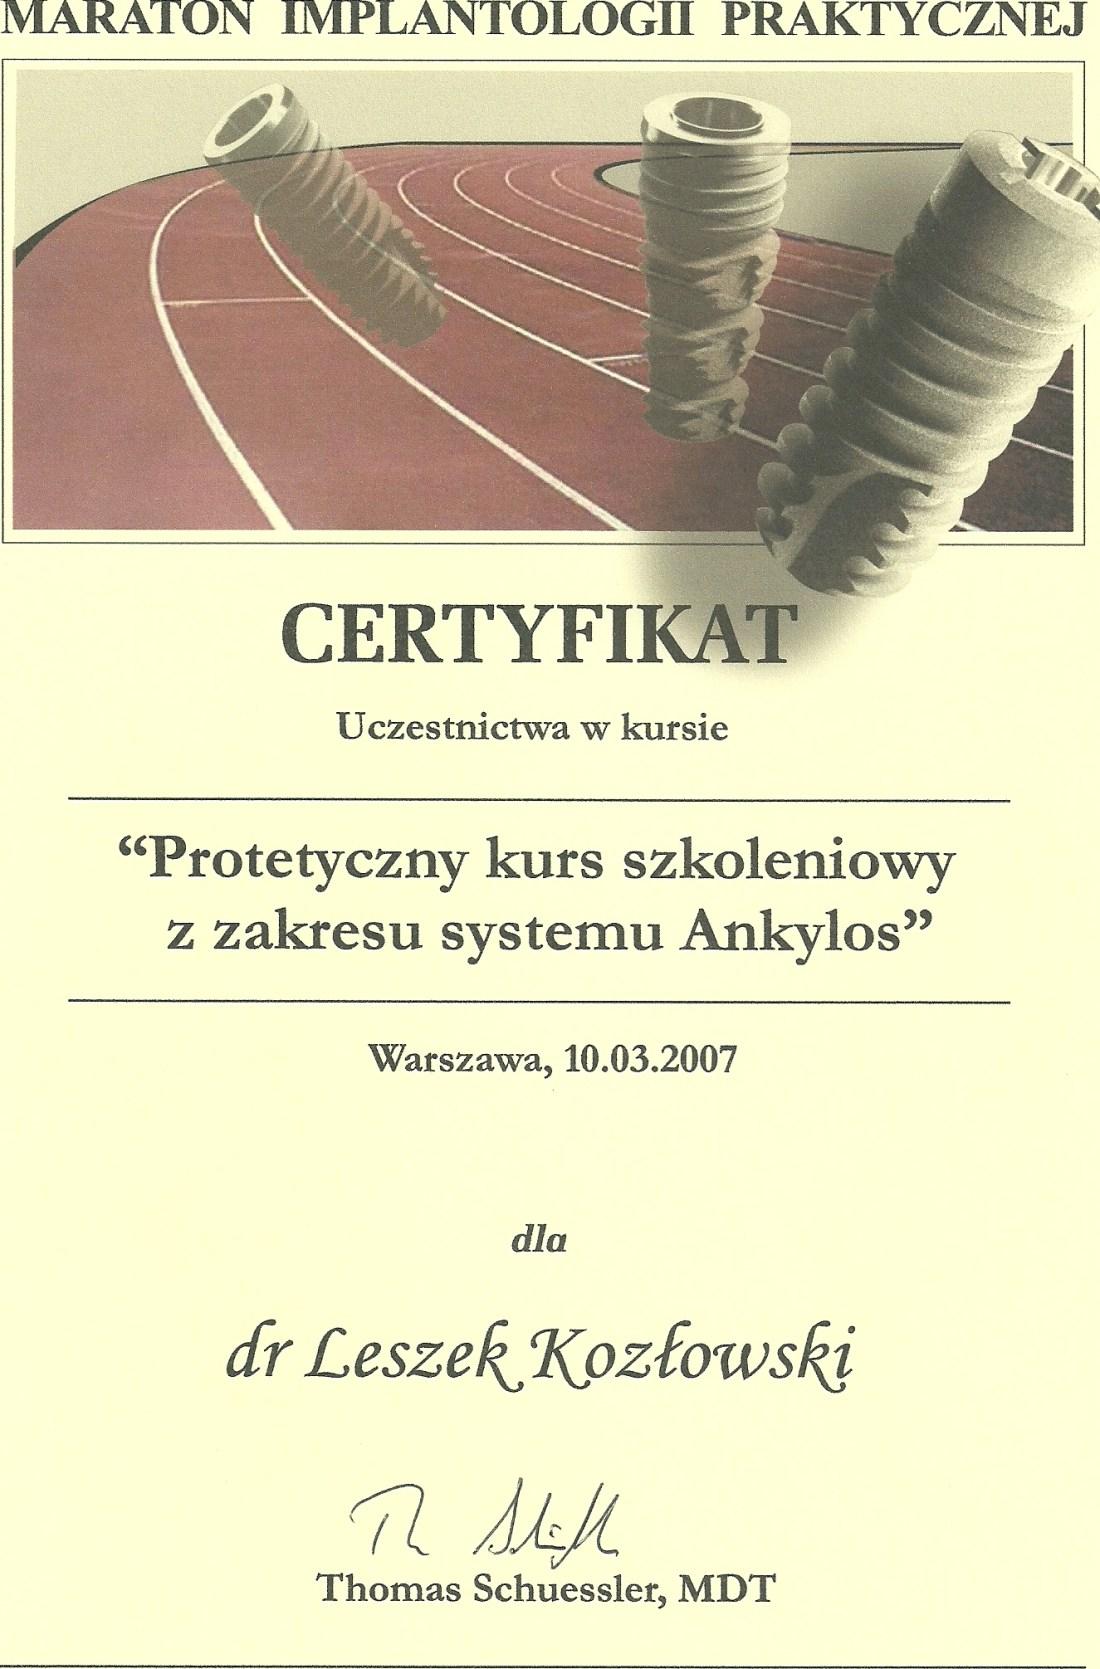 dentysta warszawa DENTYSTA WARSZAWA – DENTOKLINIKA Dentysta warszawa Leszek Kozlowski Certyfikat 13